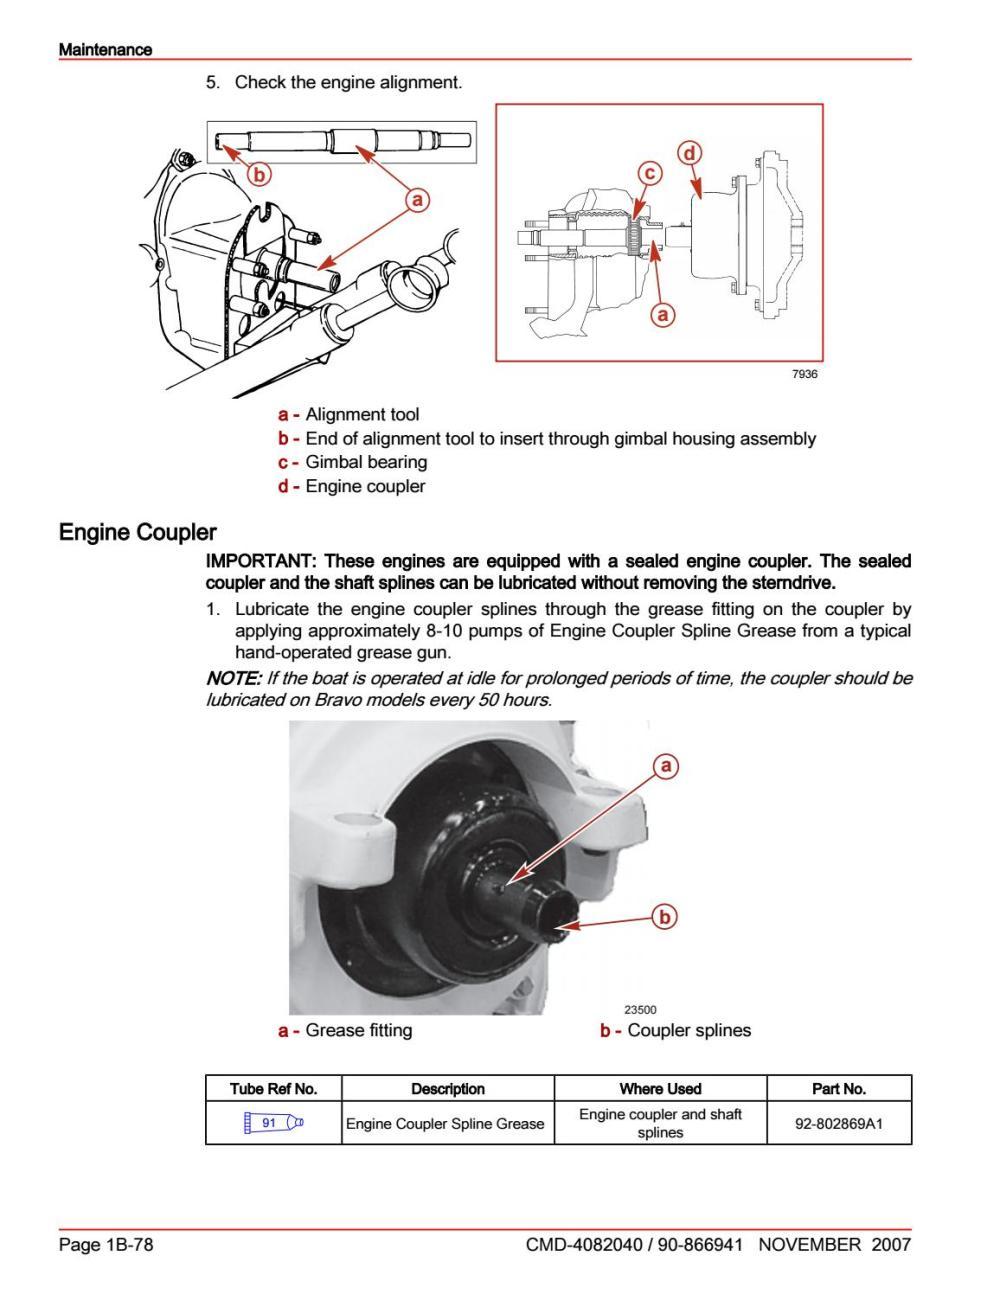 medium resolution of cummins mercruiser qsd 4 2 350 hp diesel engine service repair manual sn 88401000 and above